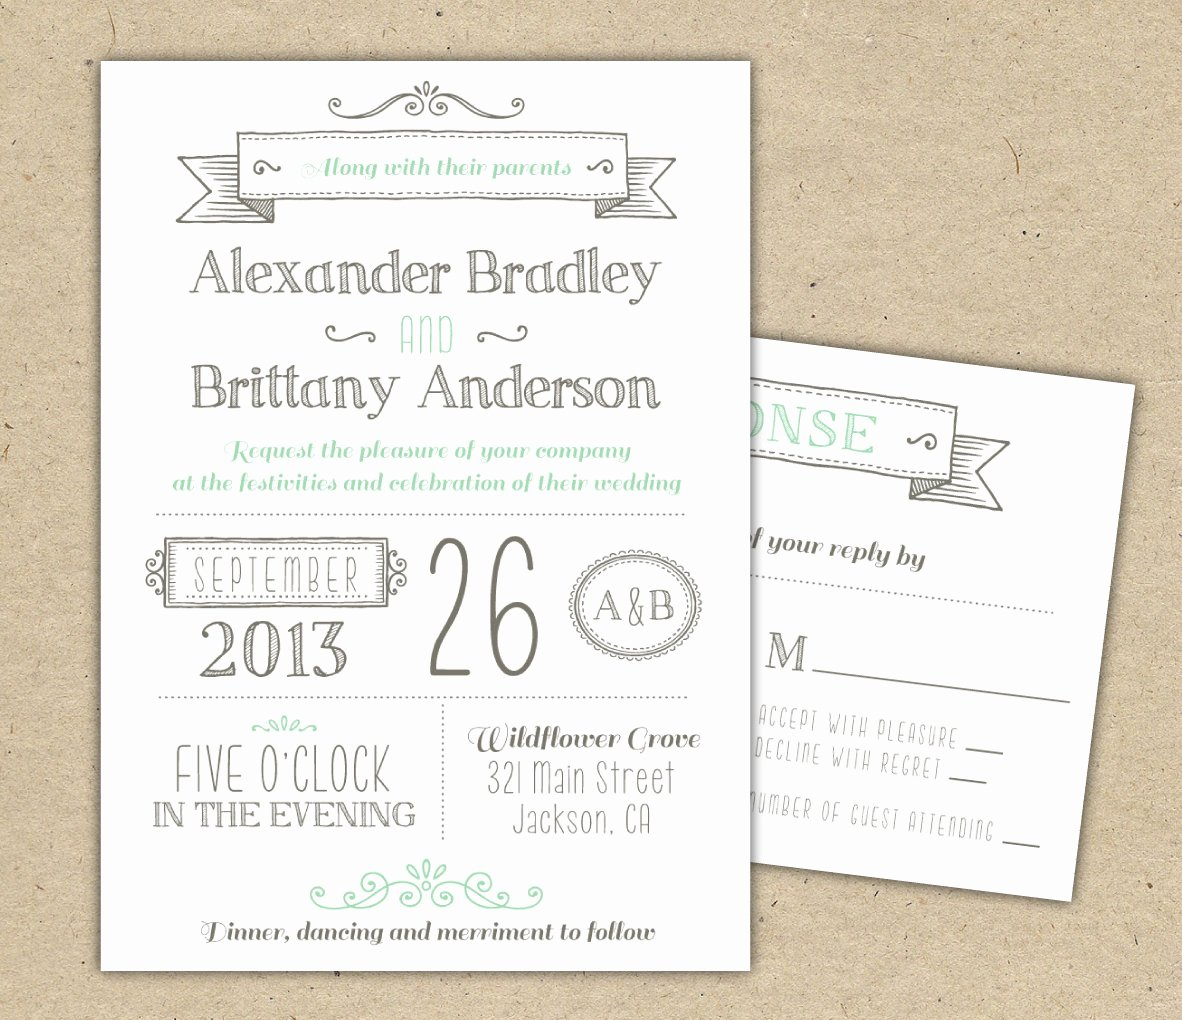 Modern Wedding Invitation Template Lovely Wedding Invitation 1041 Sample Modern Invitation Template